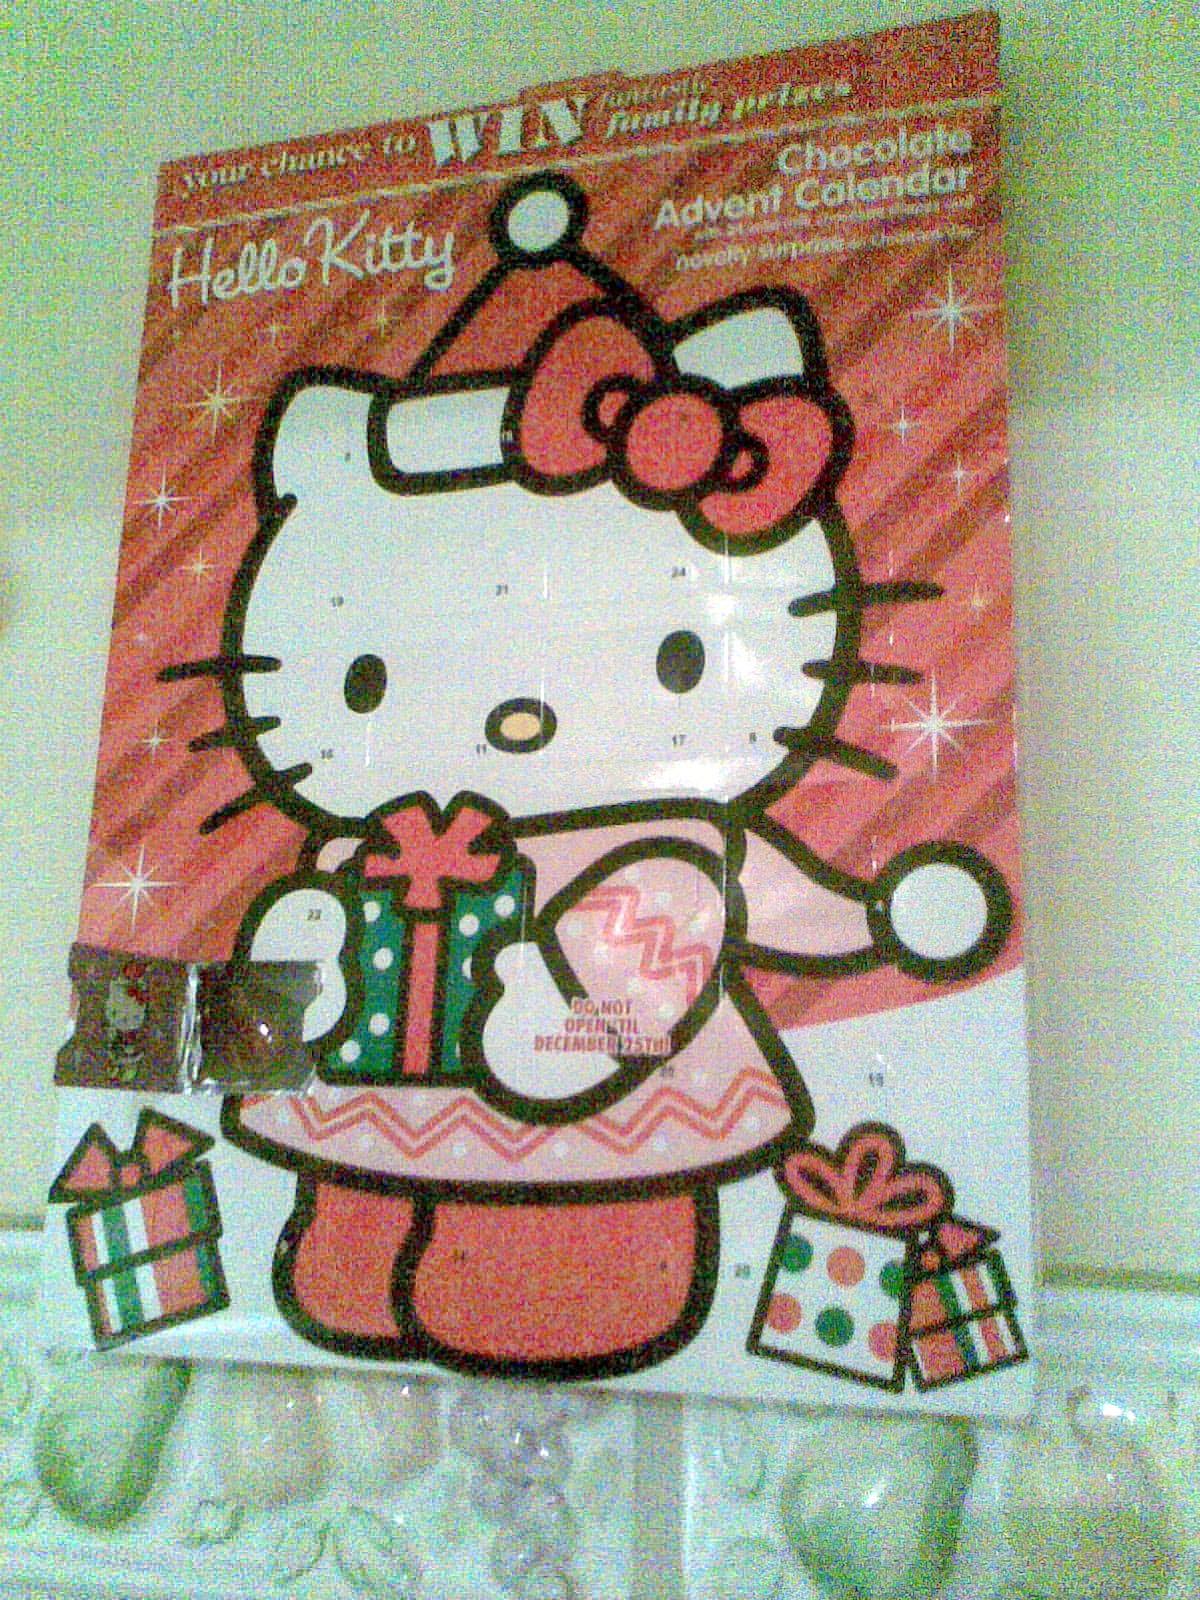 hello kitty adventi naptár Hello Kitty Advent Calendar – Hello Kitty Hell hello kitty adventi naptár